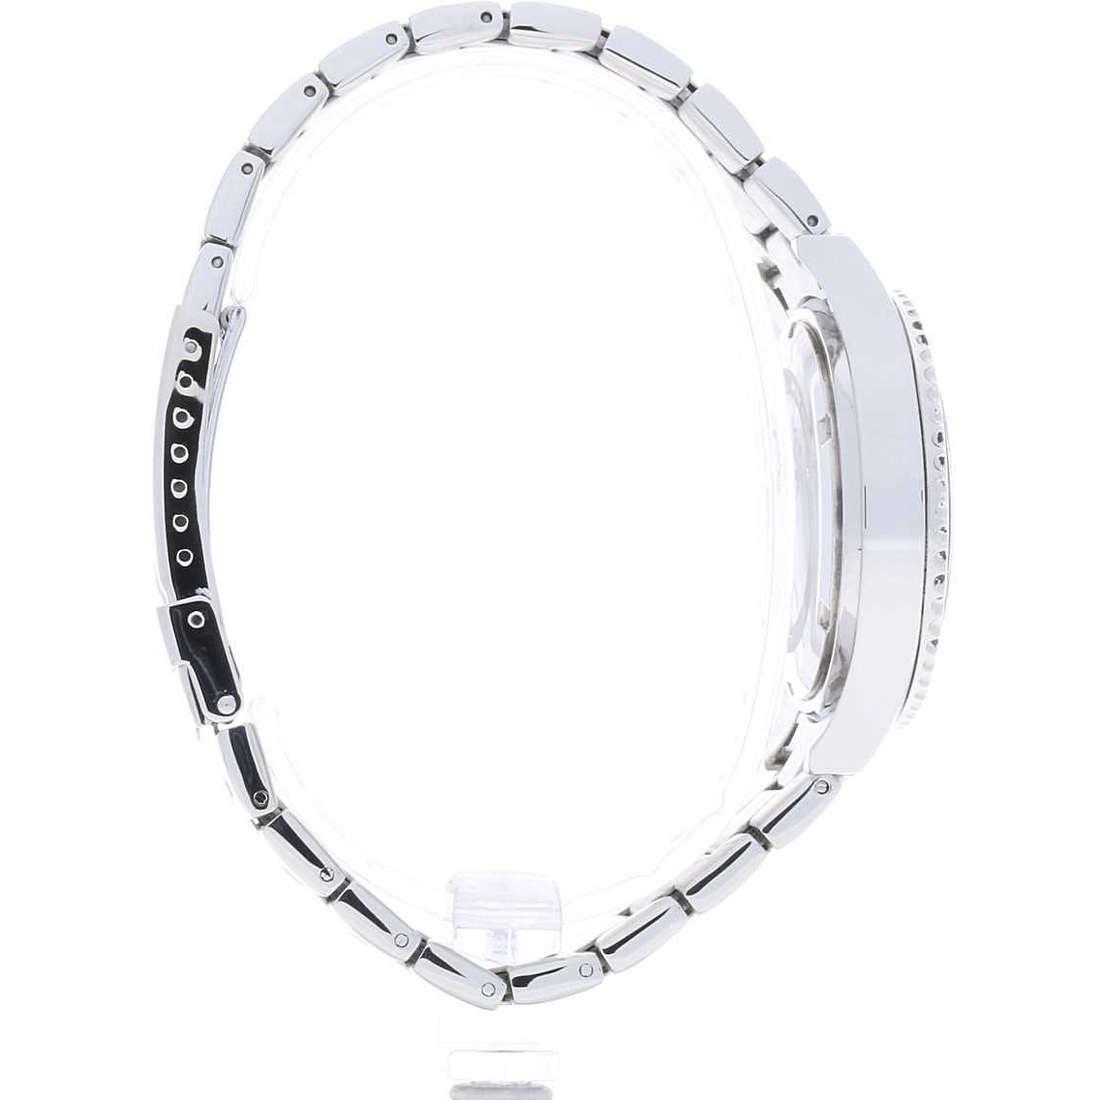 acquista orologi uomo Sector R3253161013